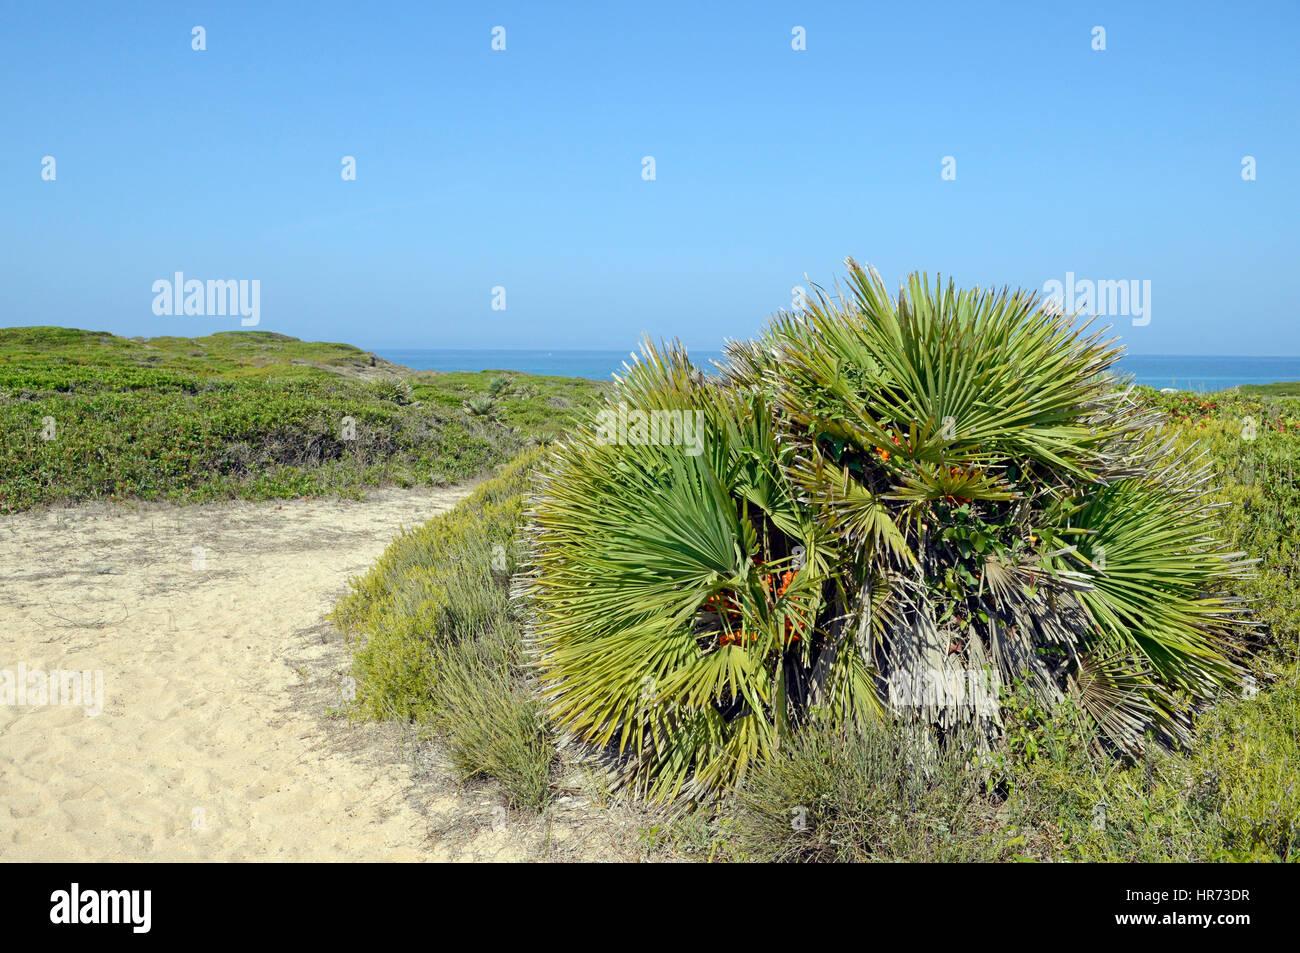 Mediterranean Fan Farn (Chamaerops humilis), in garigue, Sinis, Sardinia, italy - Stock Image